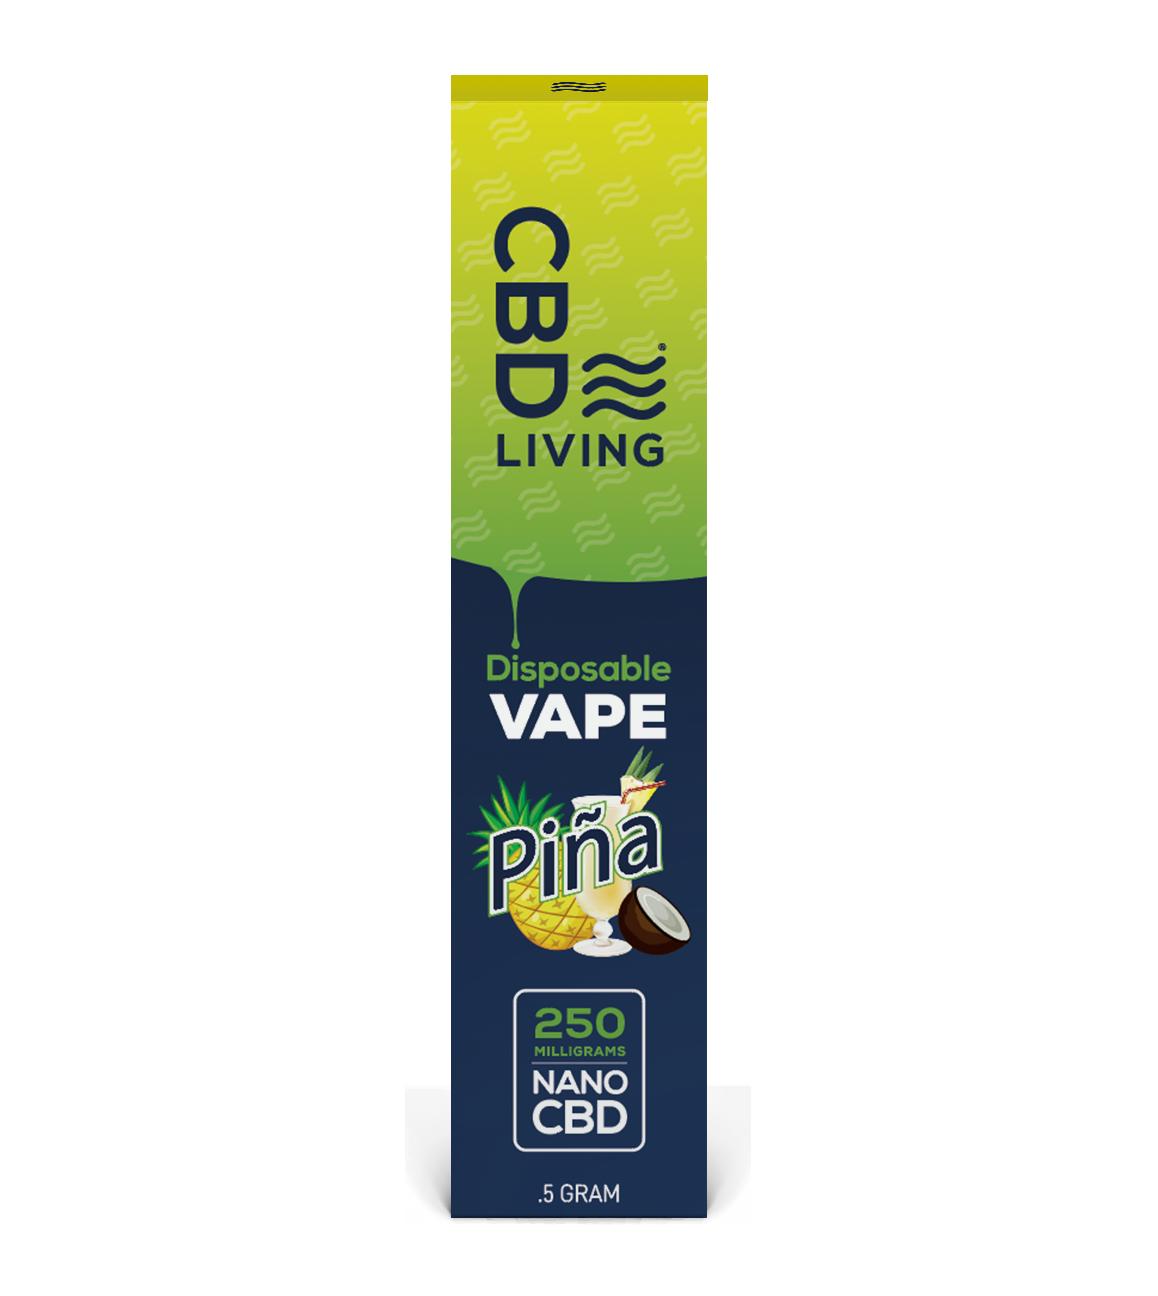 CBD Living Disposable Vape Pen - Pina 250 mg